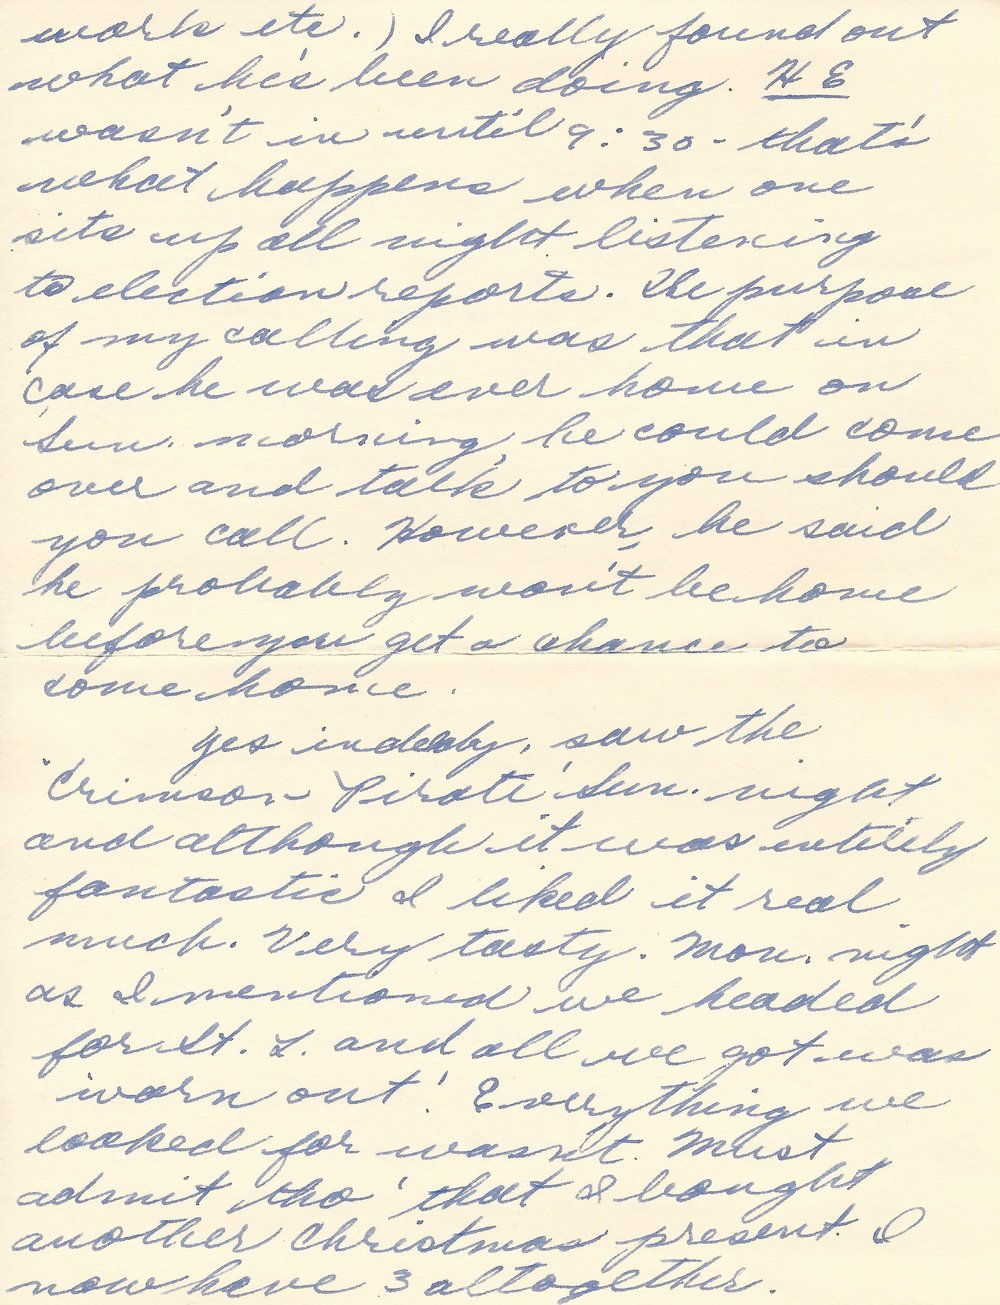 3. Nov. 4-5, 1952 (Oma)_Page_3.jpg